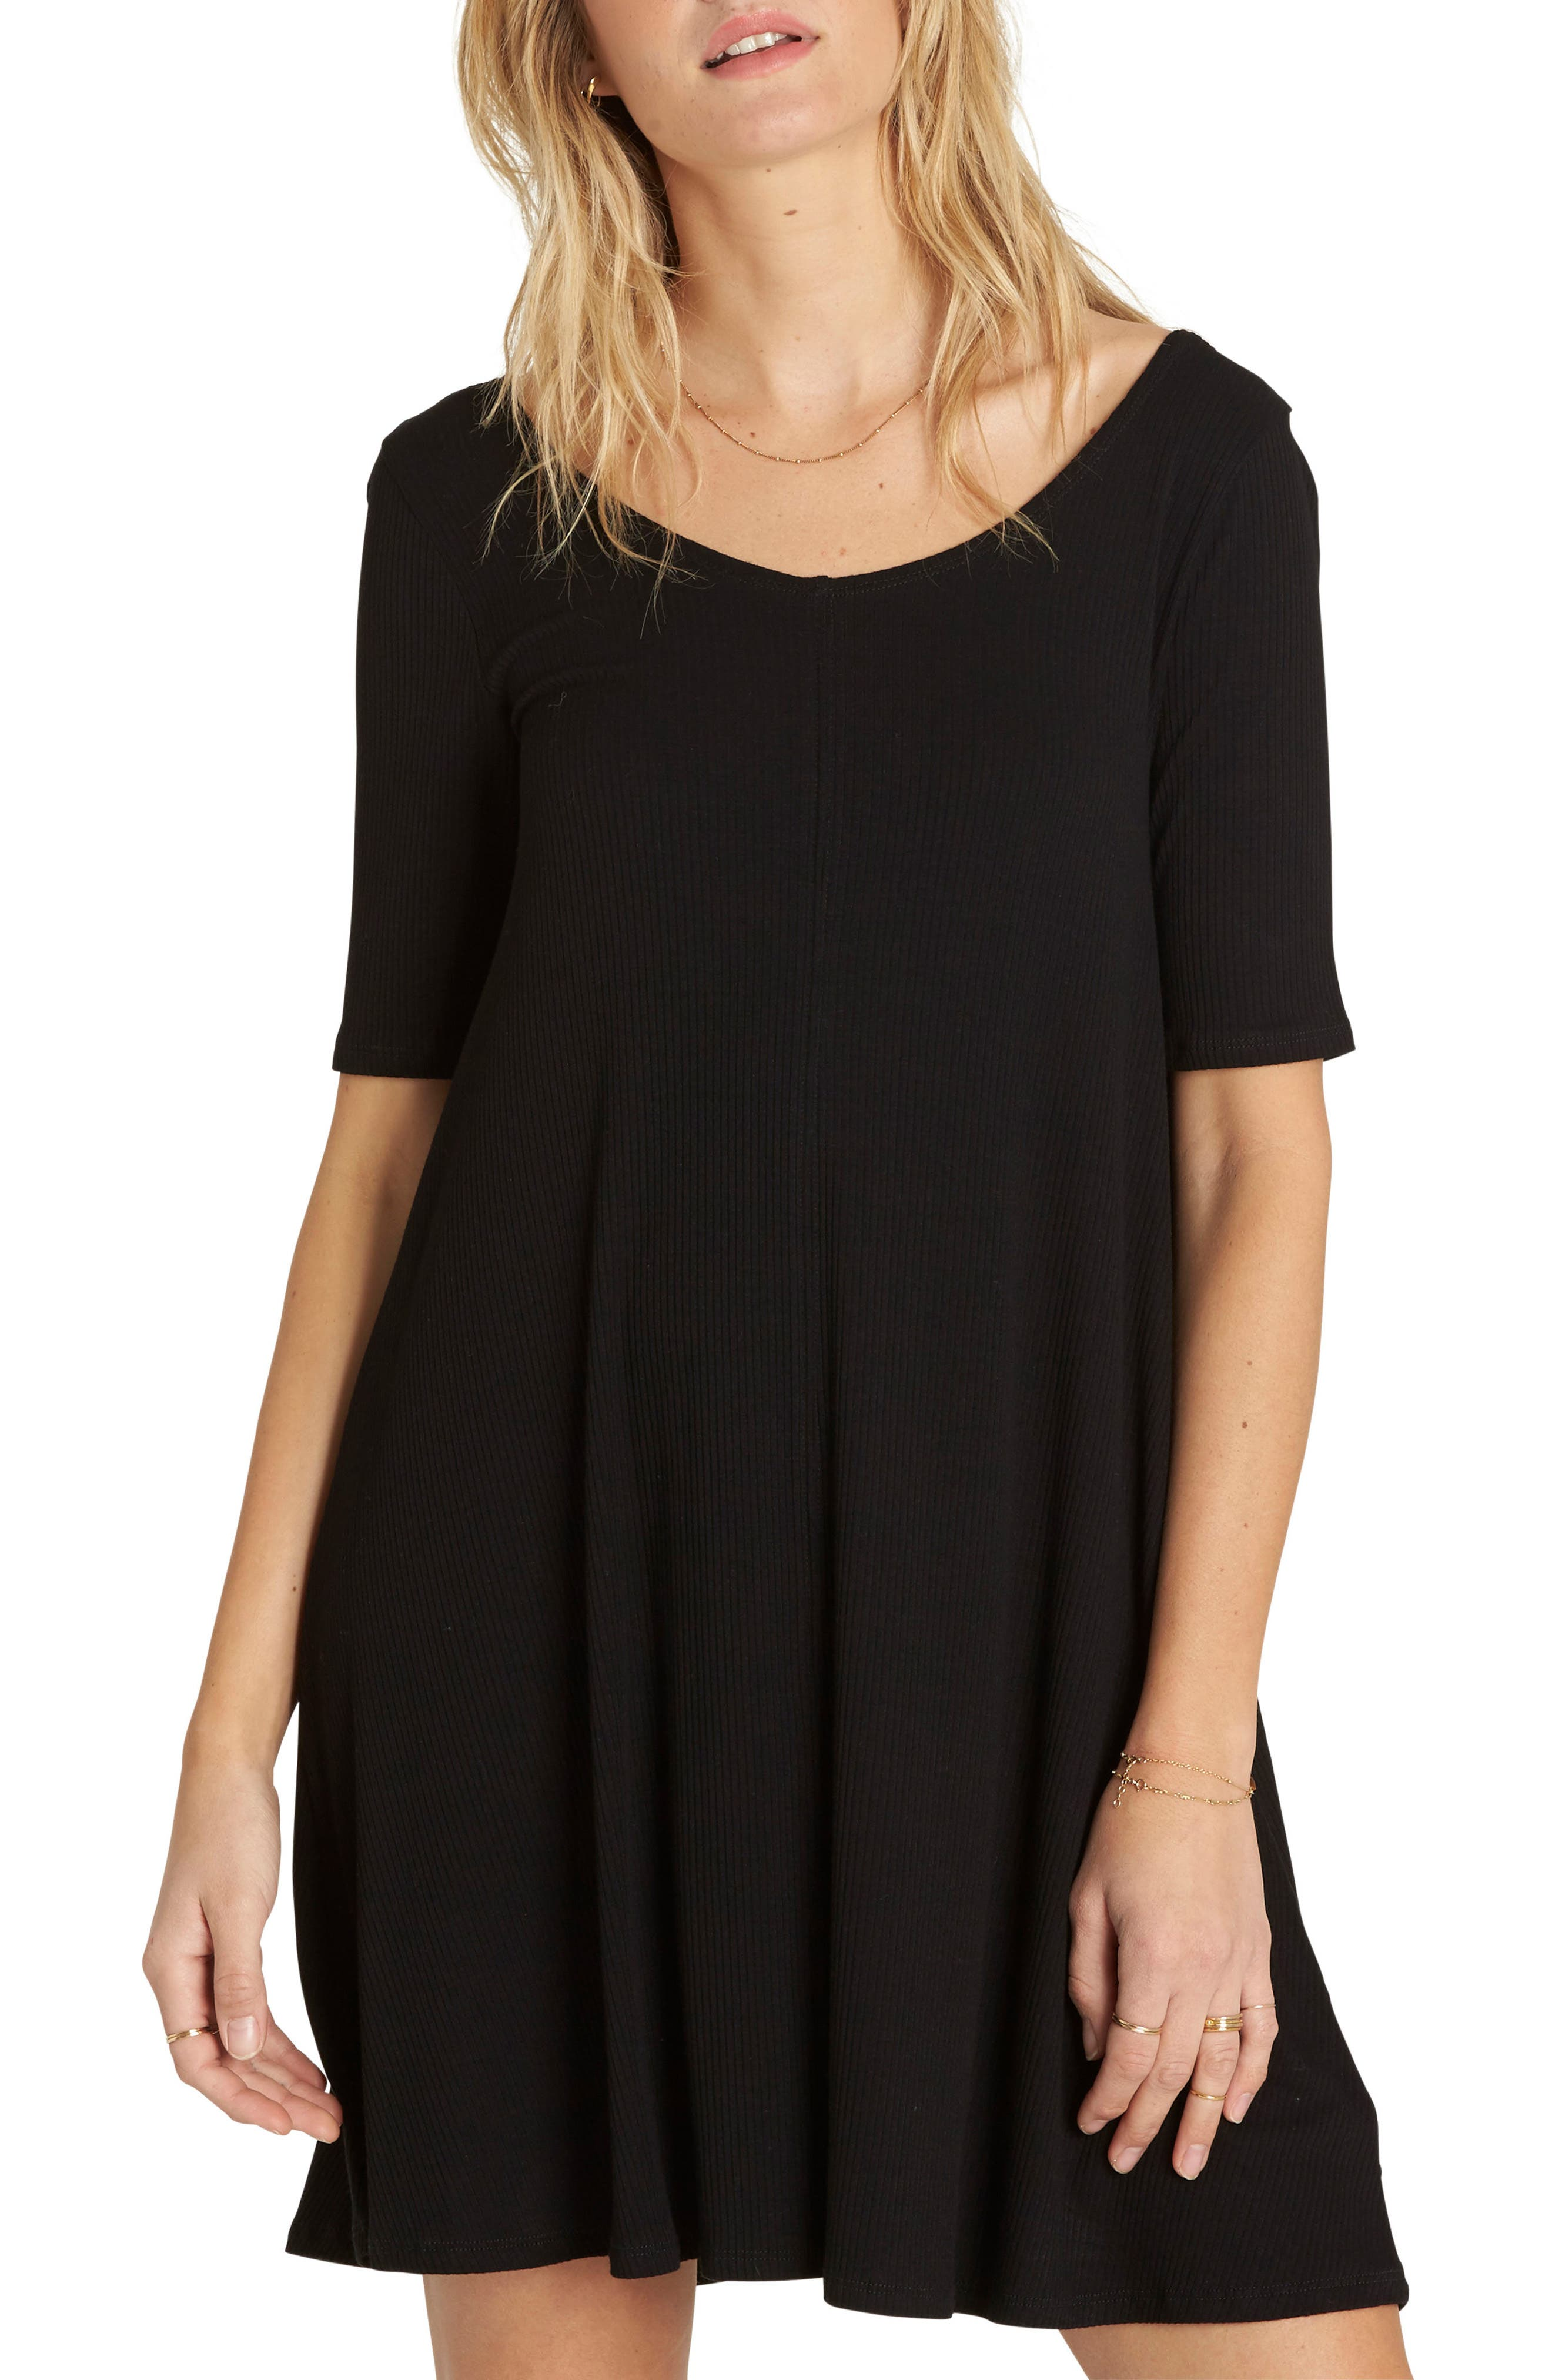 Nothing to Hide Ribbed T-Shirt Dress,                             Main thumbnail 1, color,                             Black